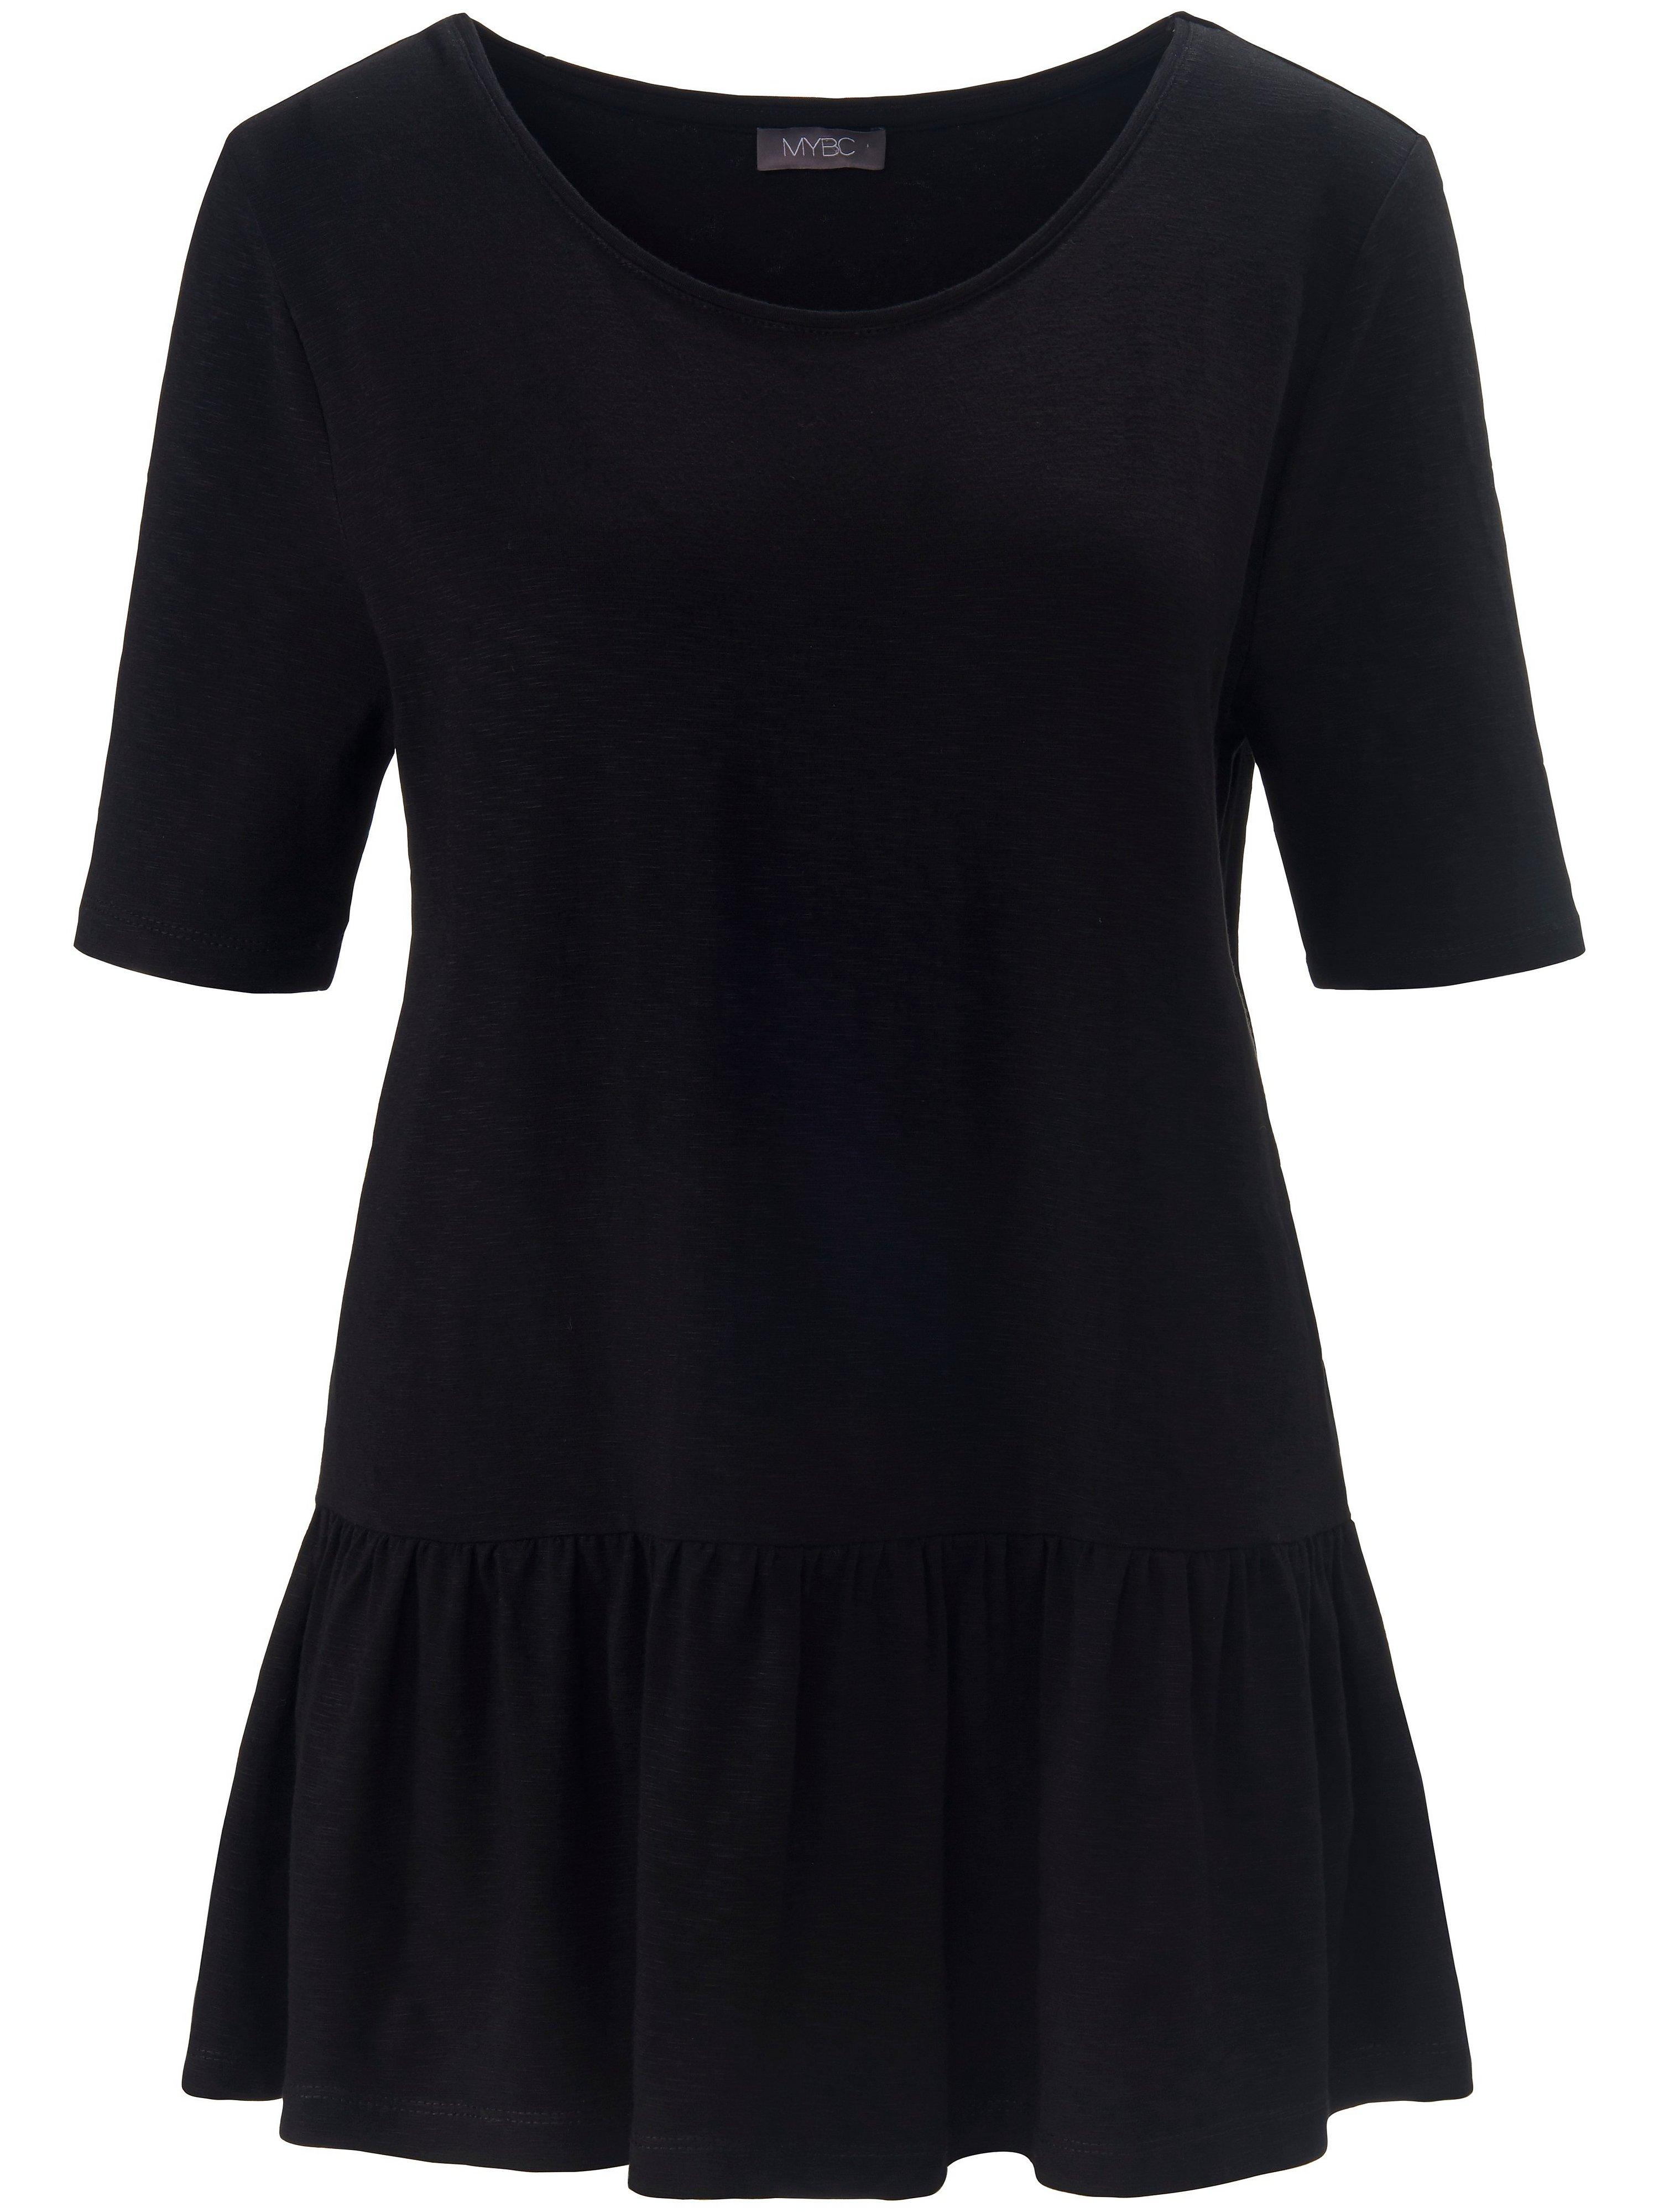 Round neck top short sleeves MYBC black